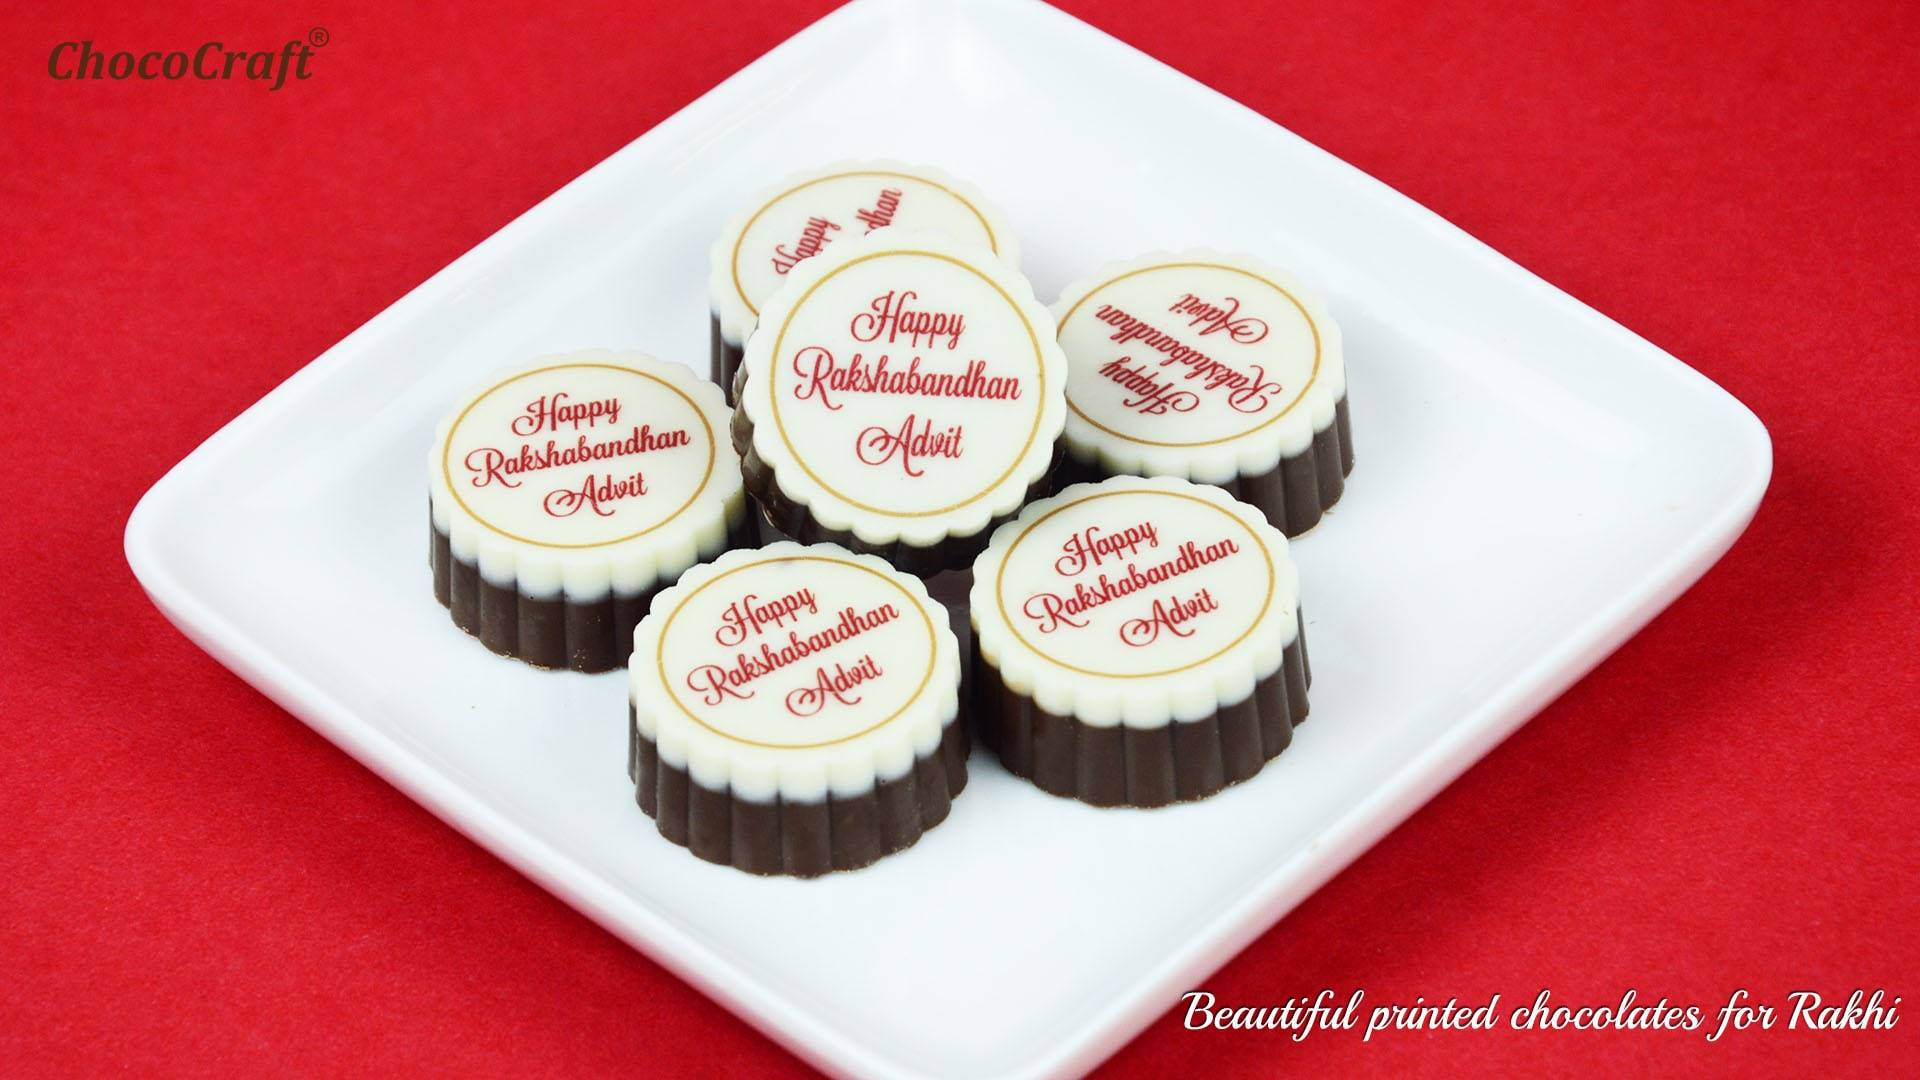 Printed chocolates for Rakshabandhan